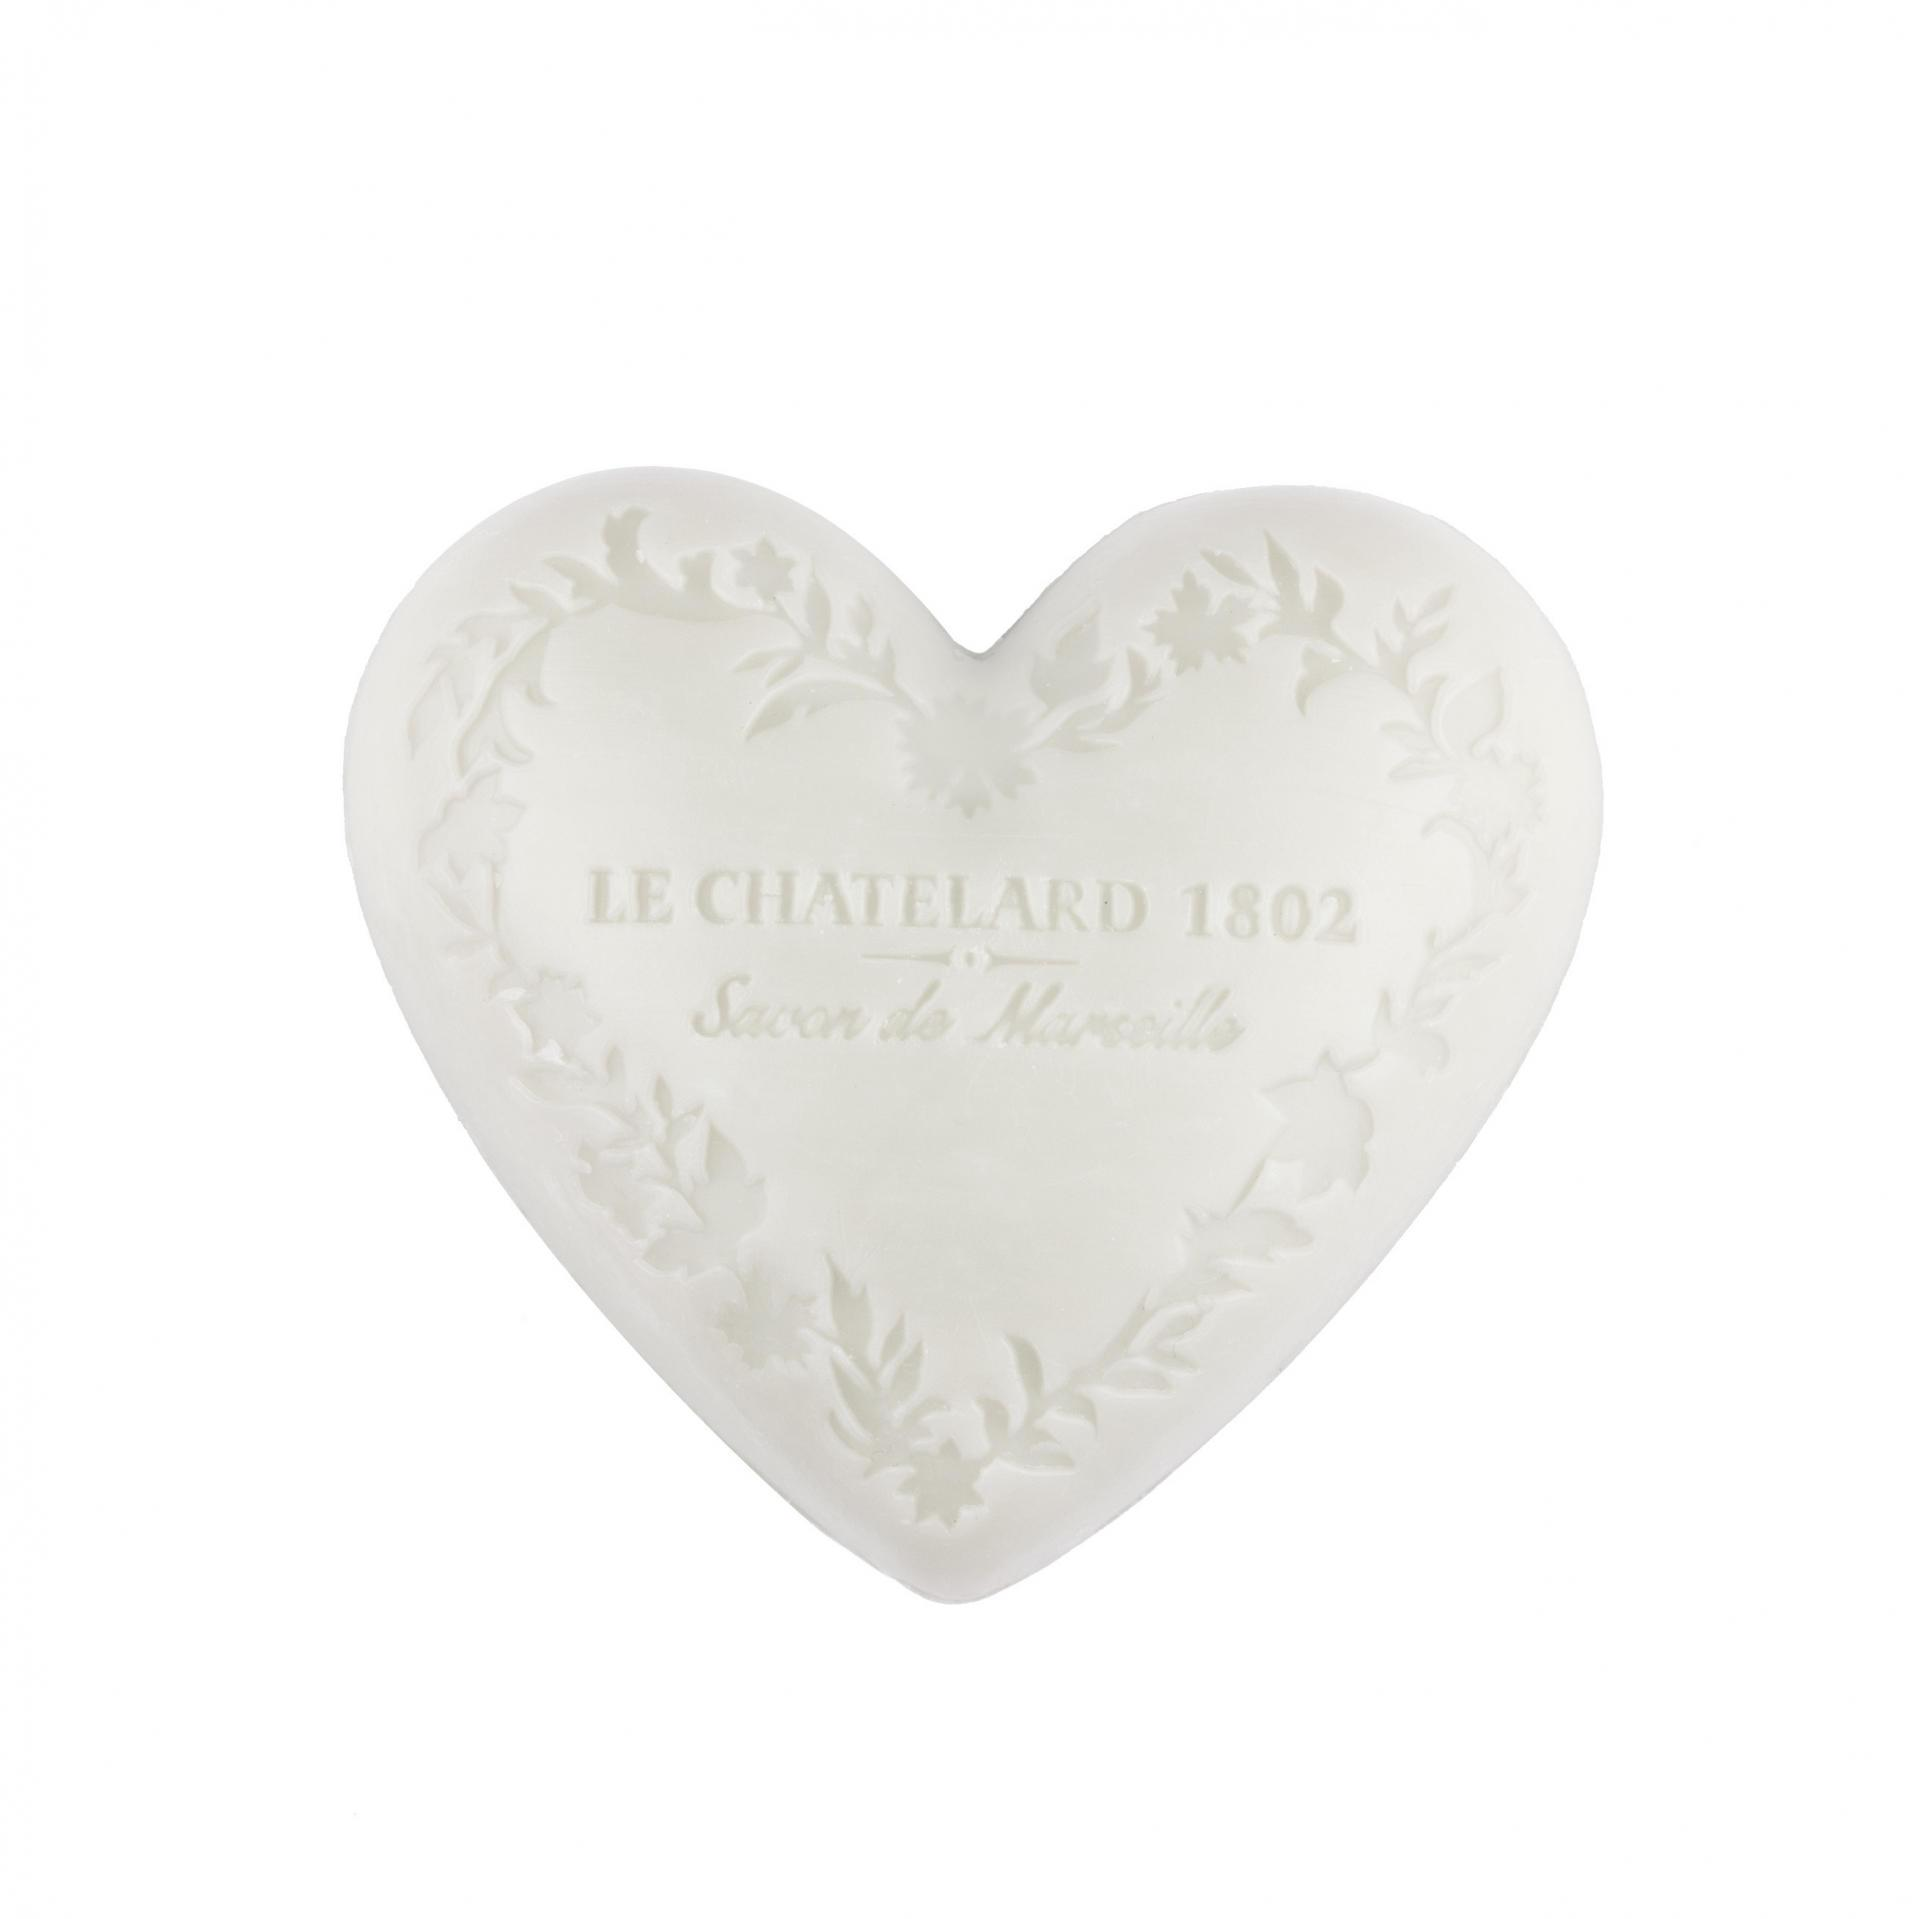 LE CHATELARD Mýdlo Heart - jasmín a mošus 100gr, bílá barva